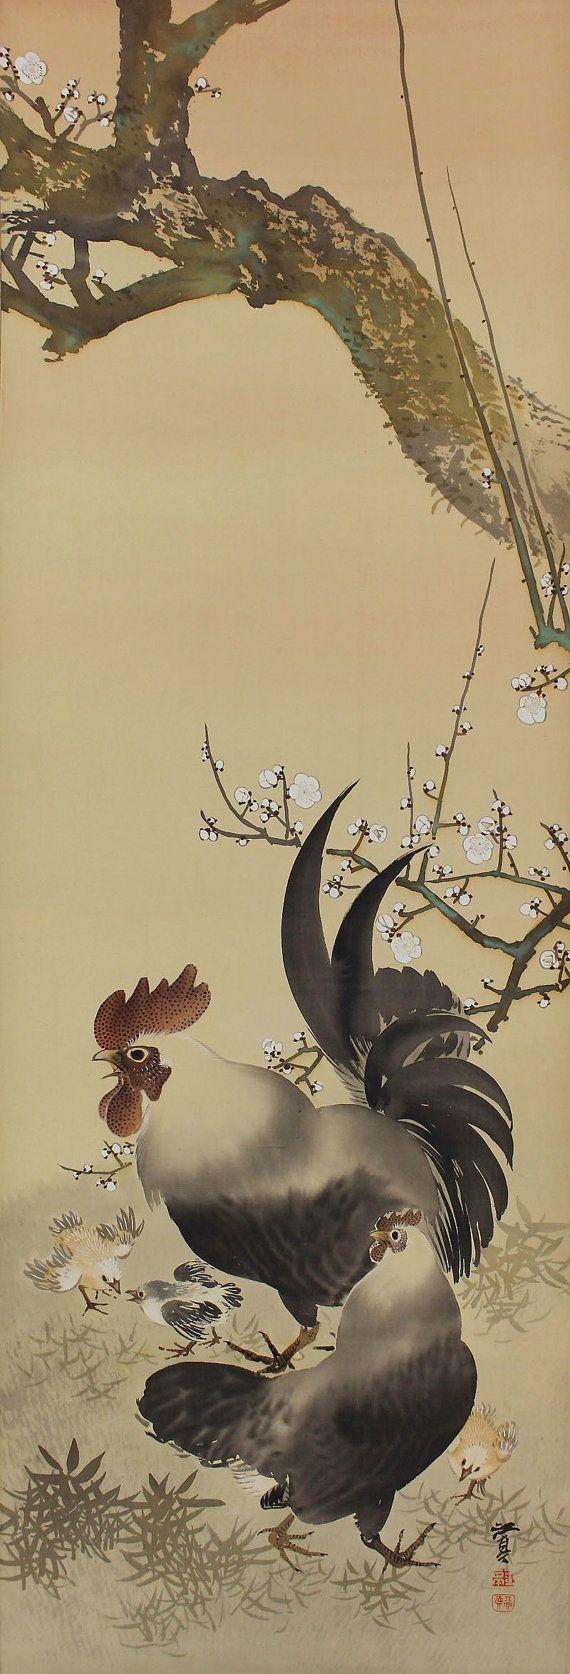 239 best Birds SUMI-E images on Pinterest | Asian art, Chinese ...